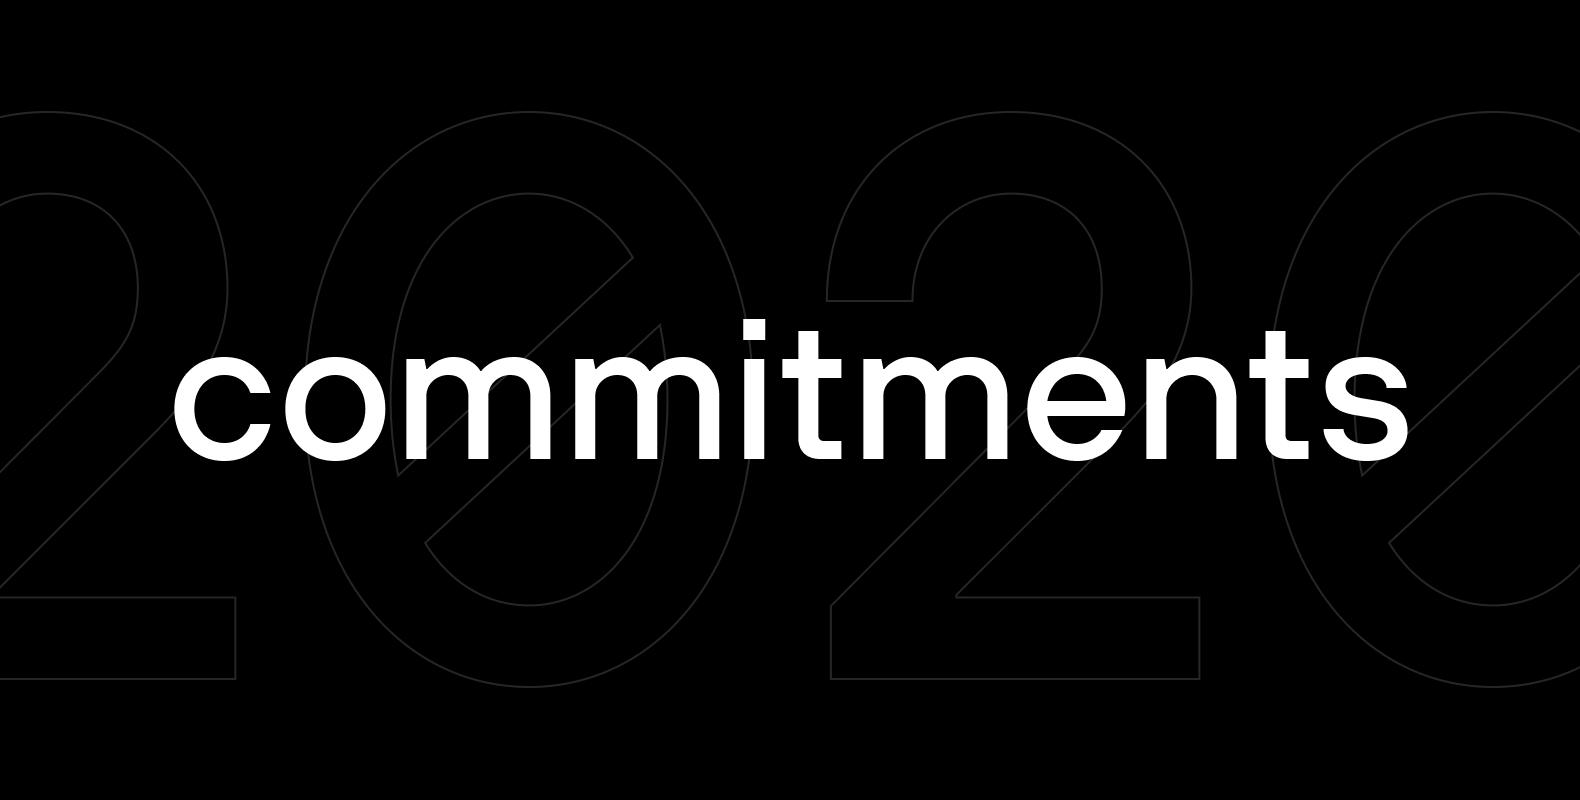 2020 commitments